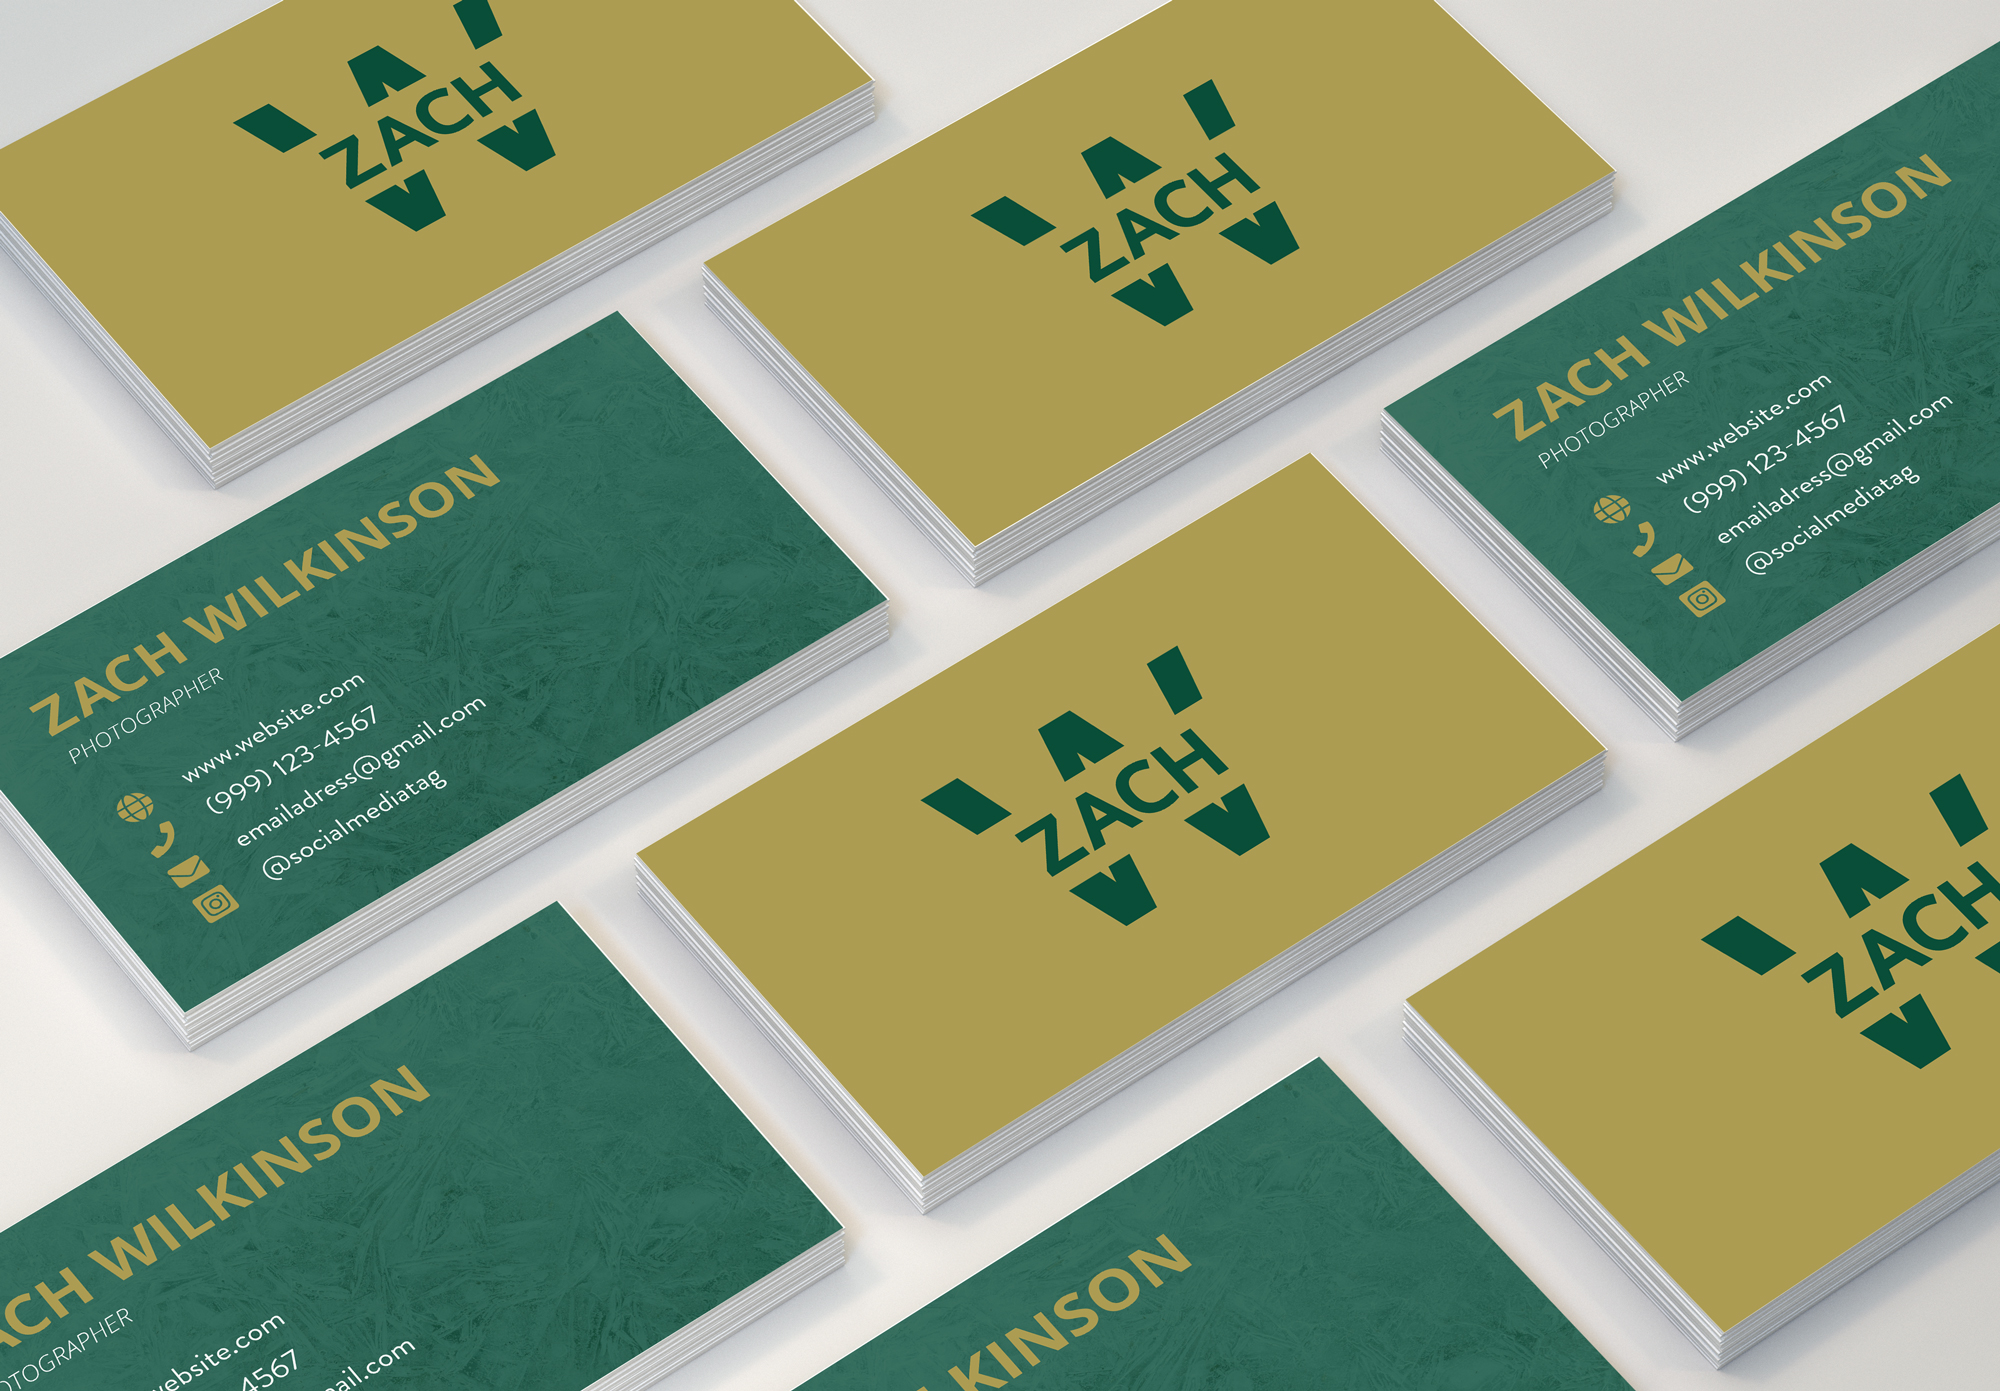 Zach Wilkinson business cards